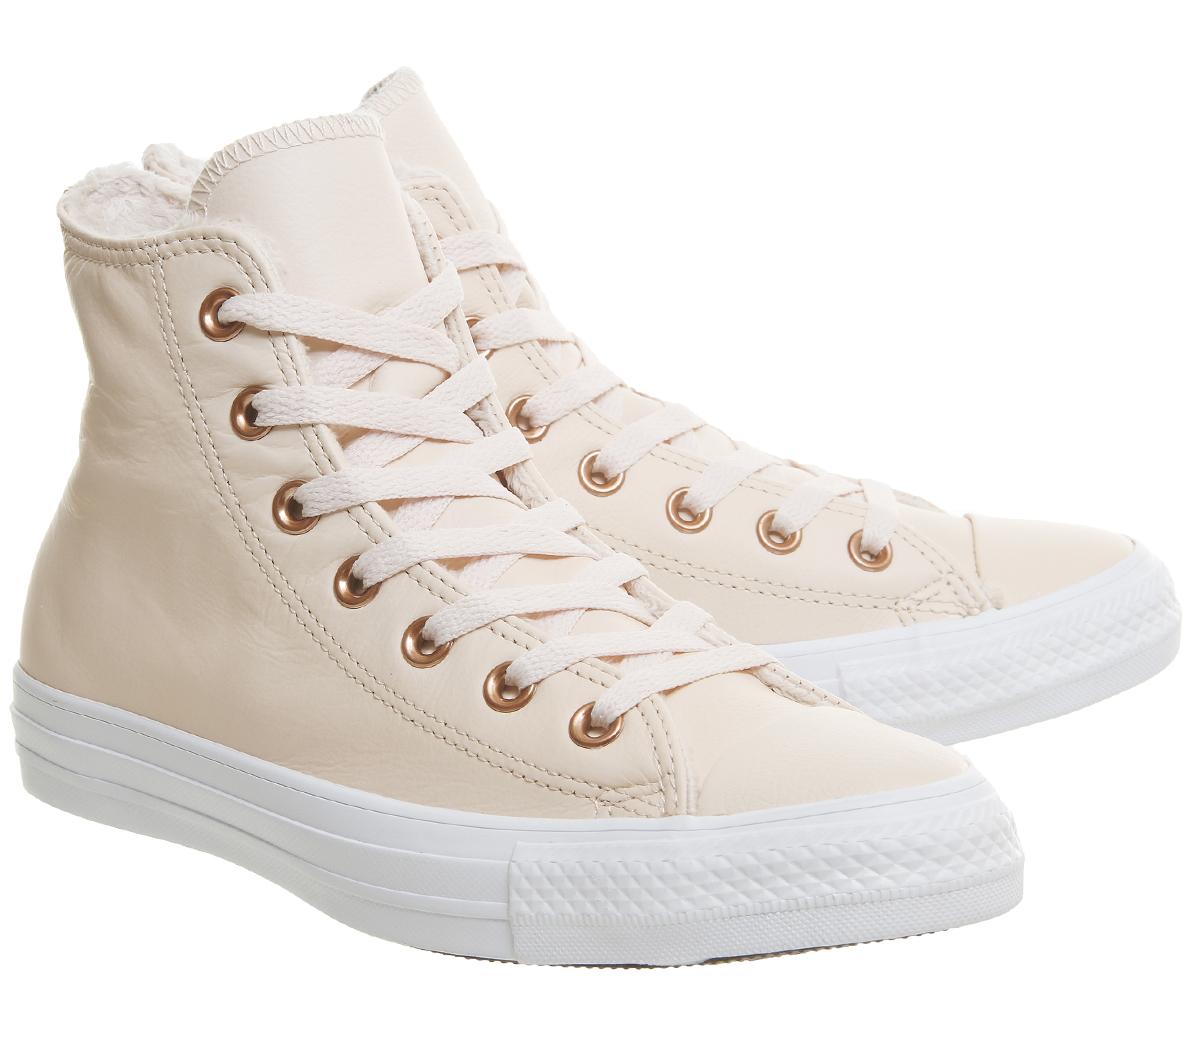 1523de65f18 ... spain chaussures femme converse all star hi cuir pastel a21b8 d64a8